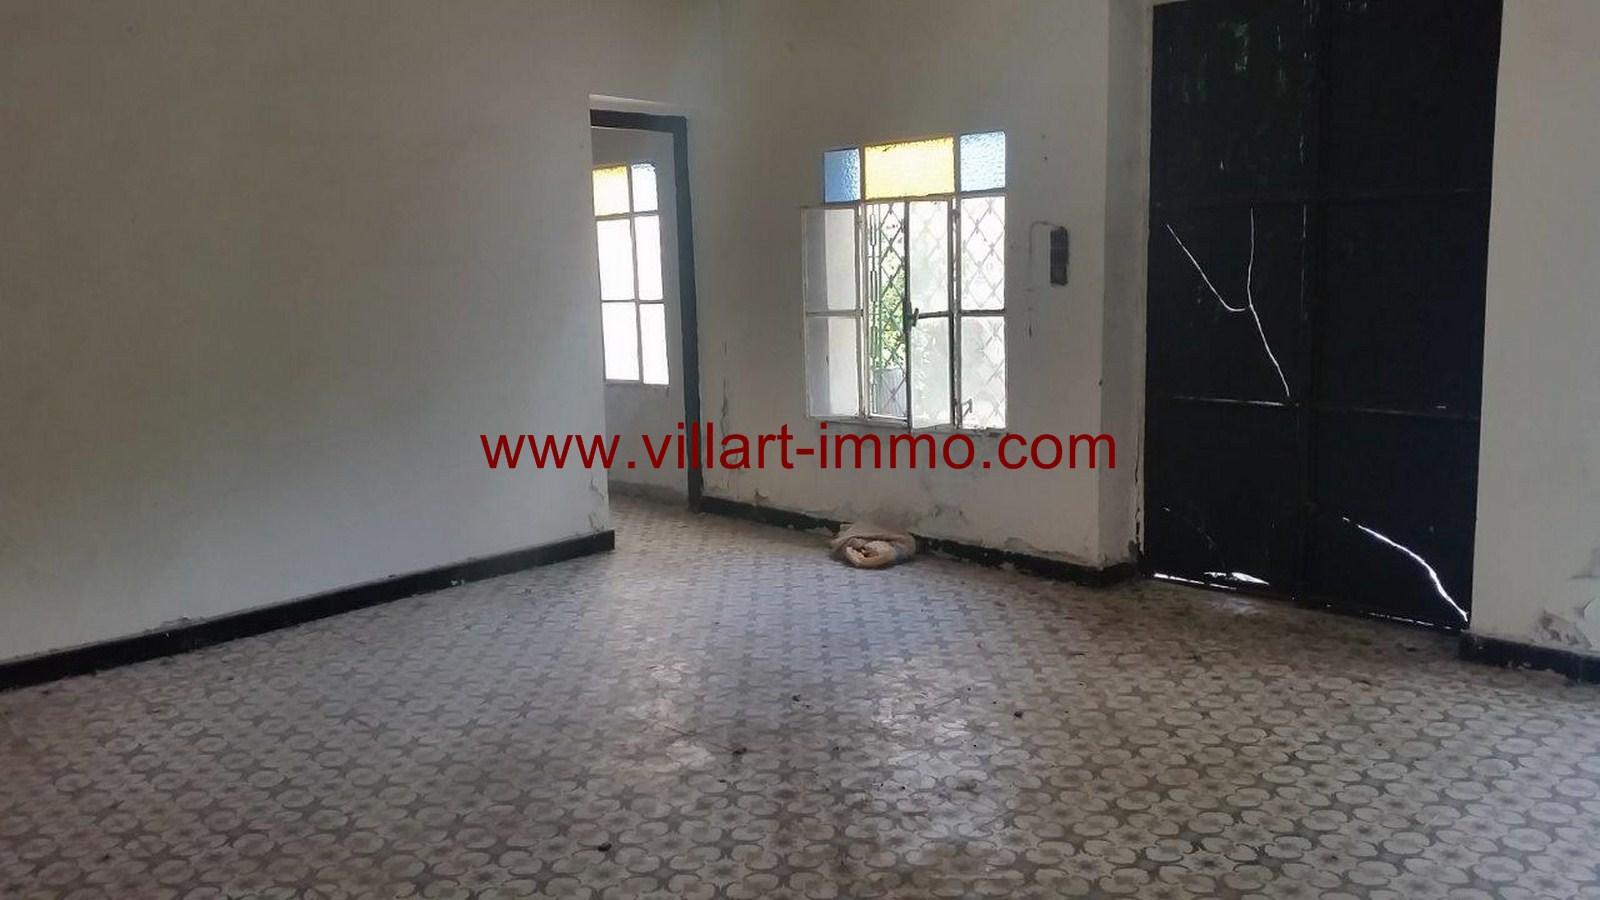 11-vente-maison-tanger-marchan-salon-3-vm381-villart-immo